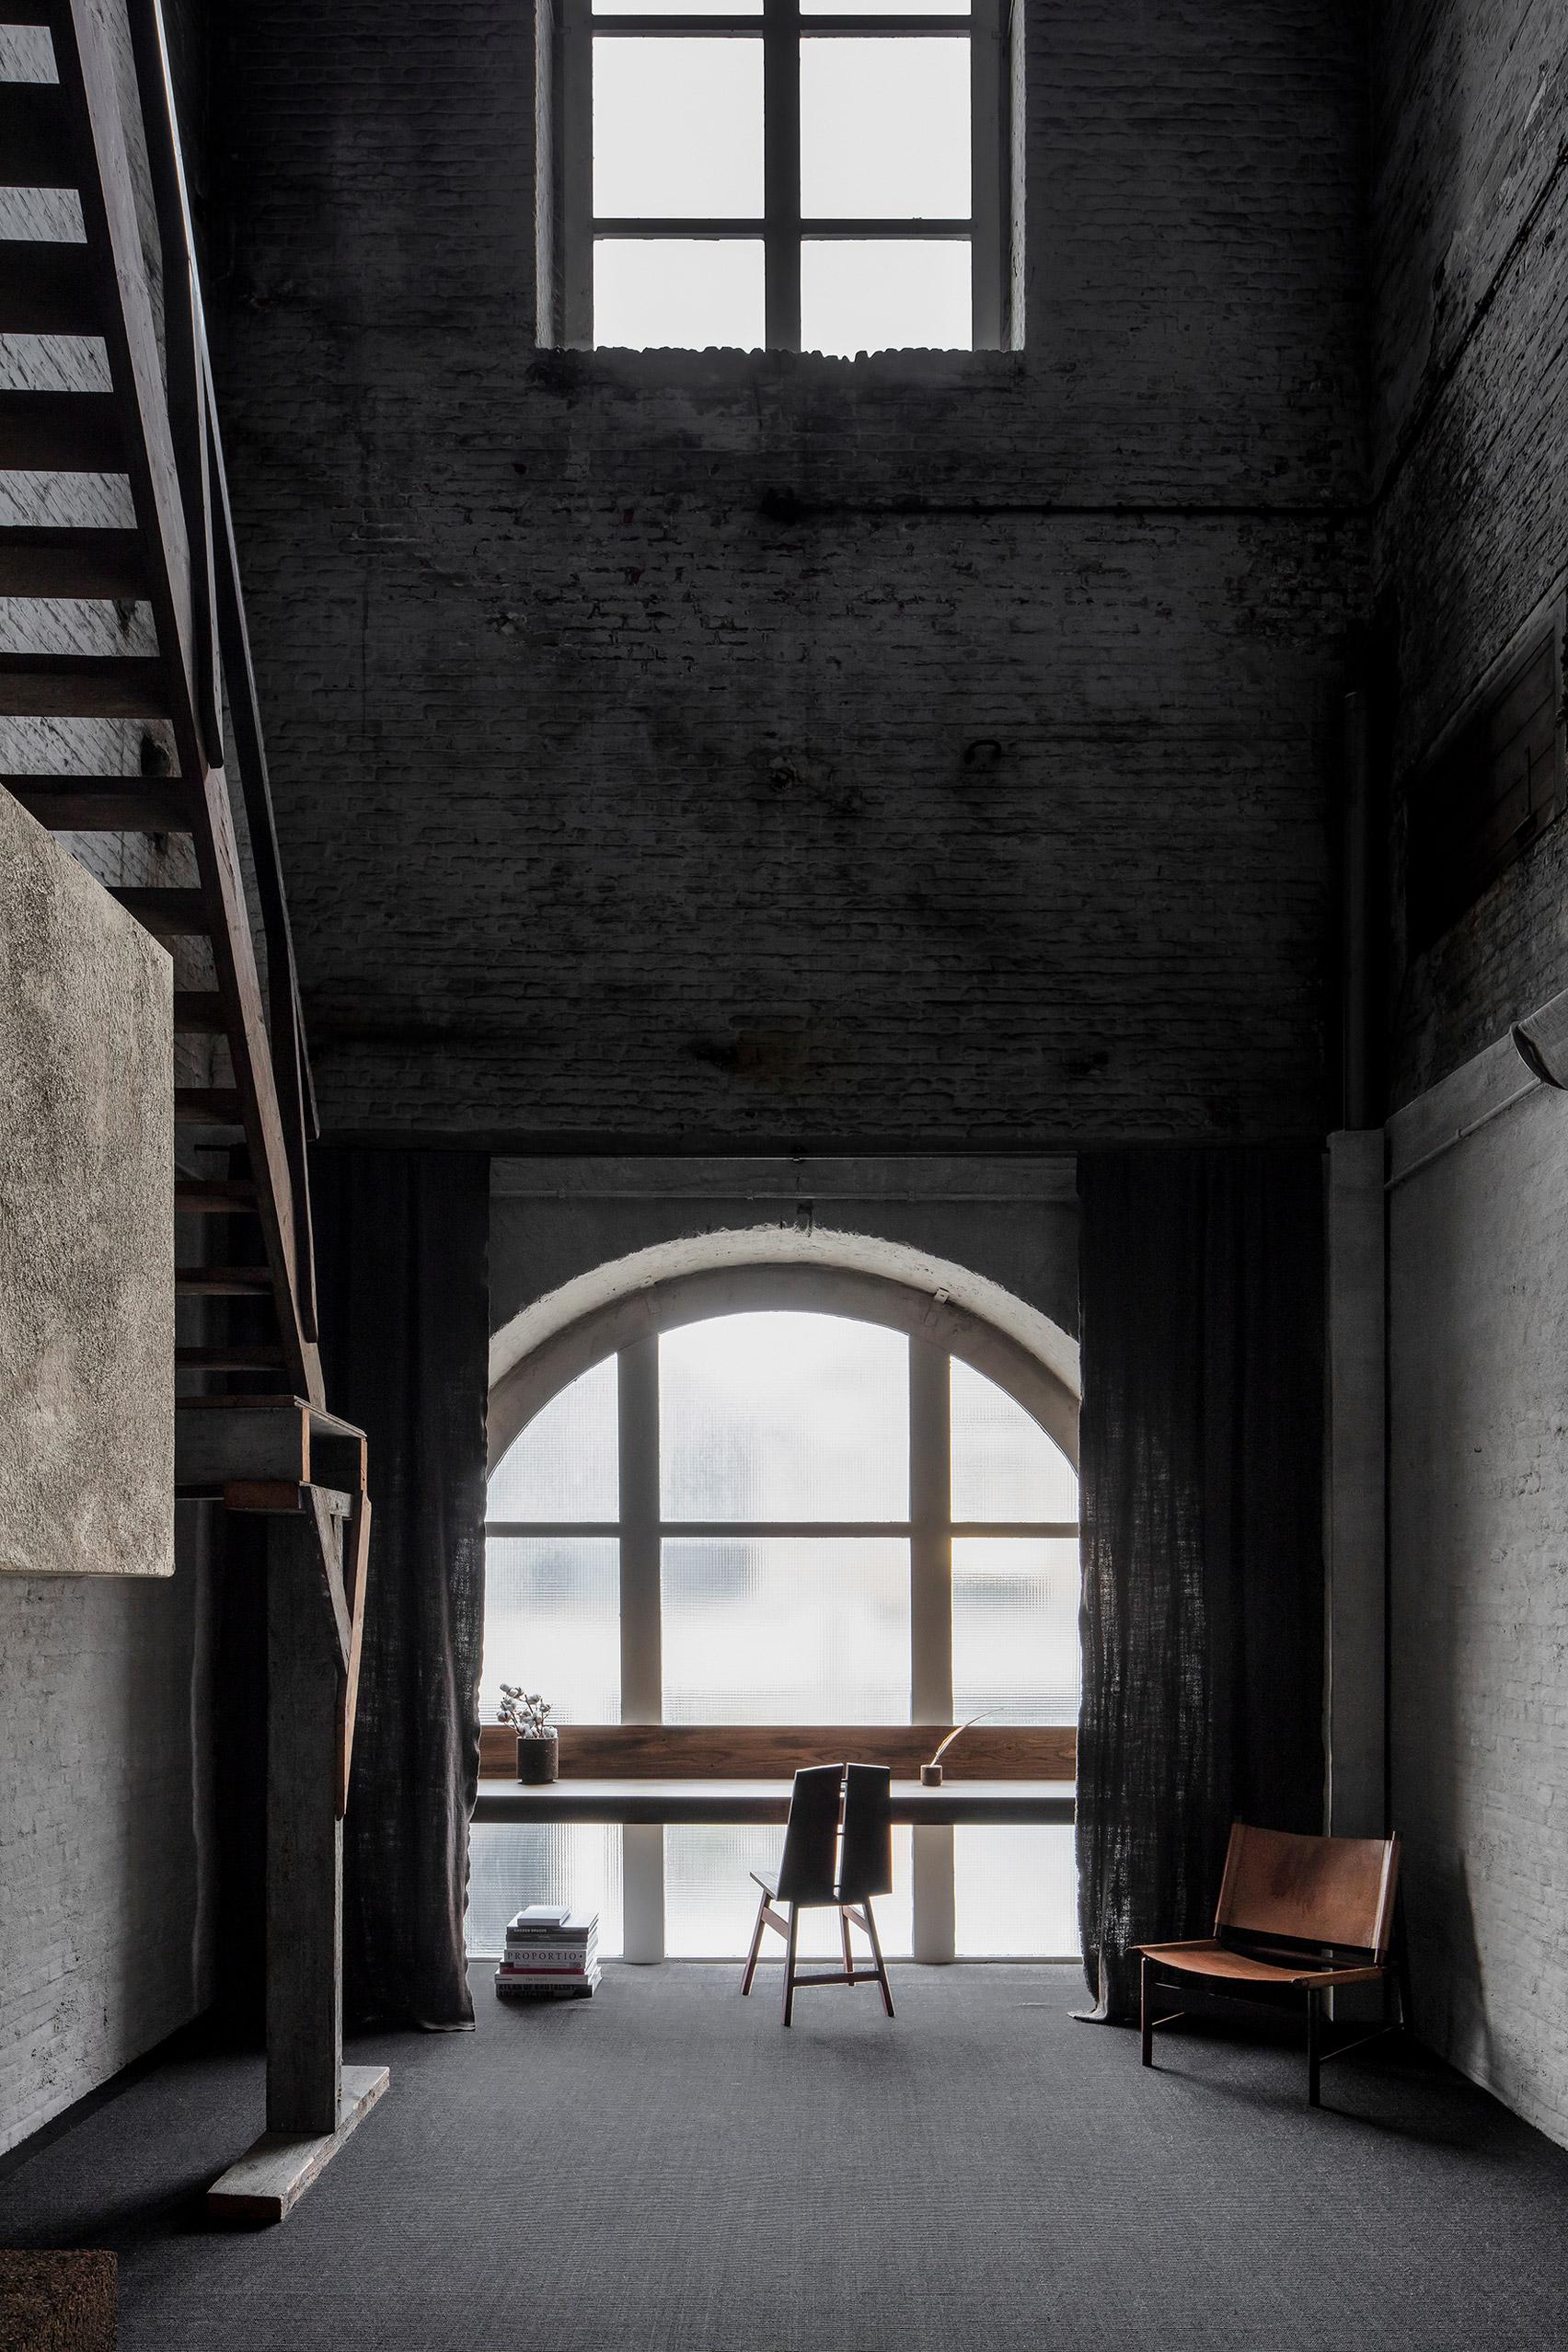 Still Room in Antwerp is a silent refuge